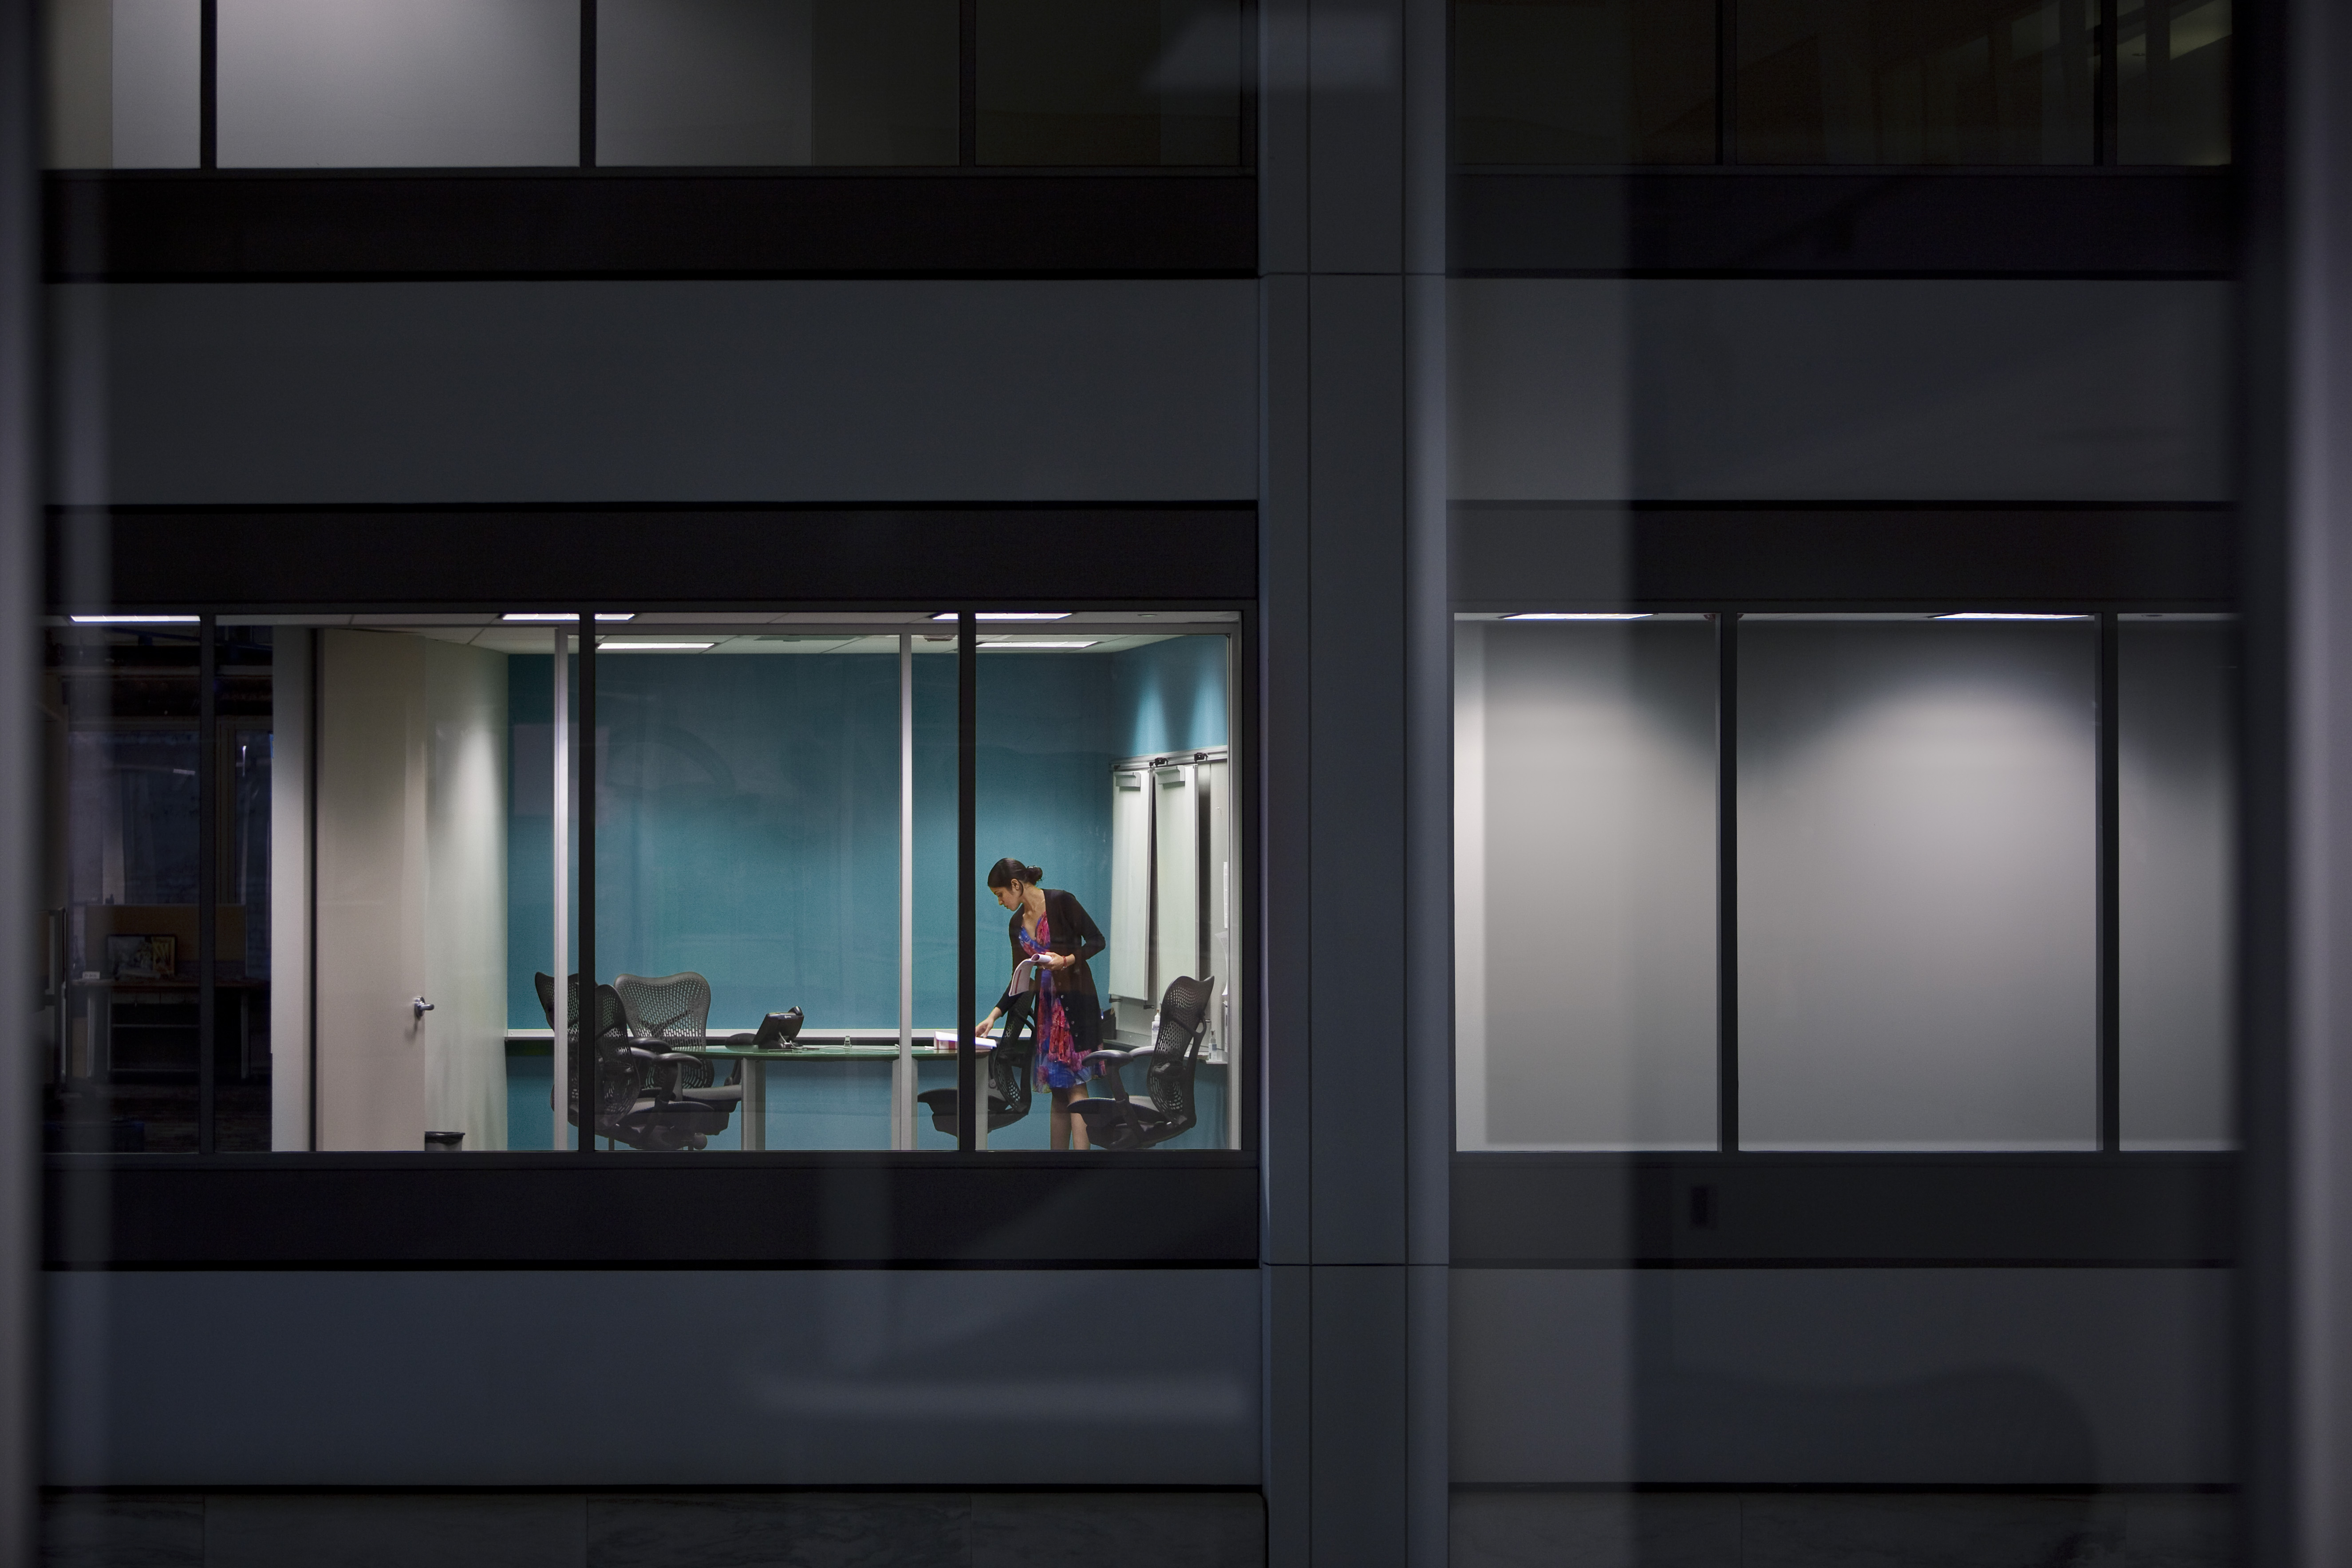 Business woman preparing for meeting